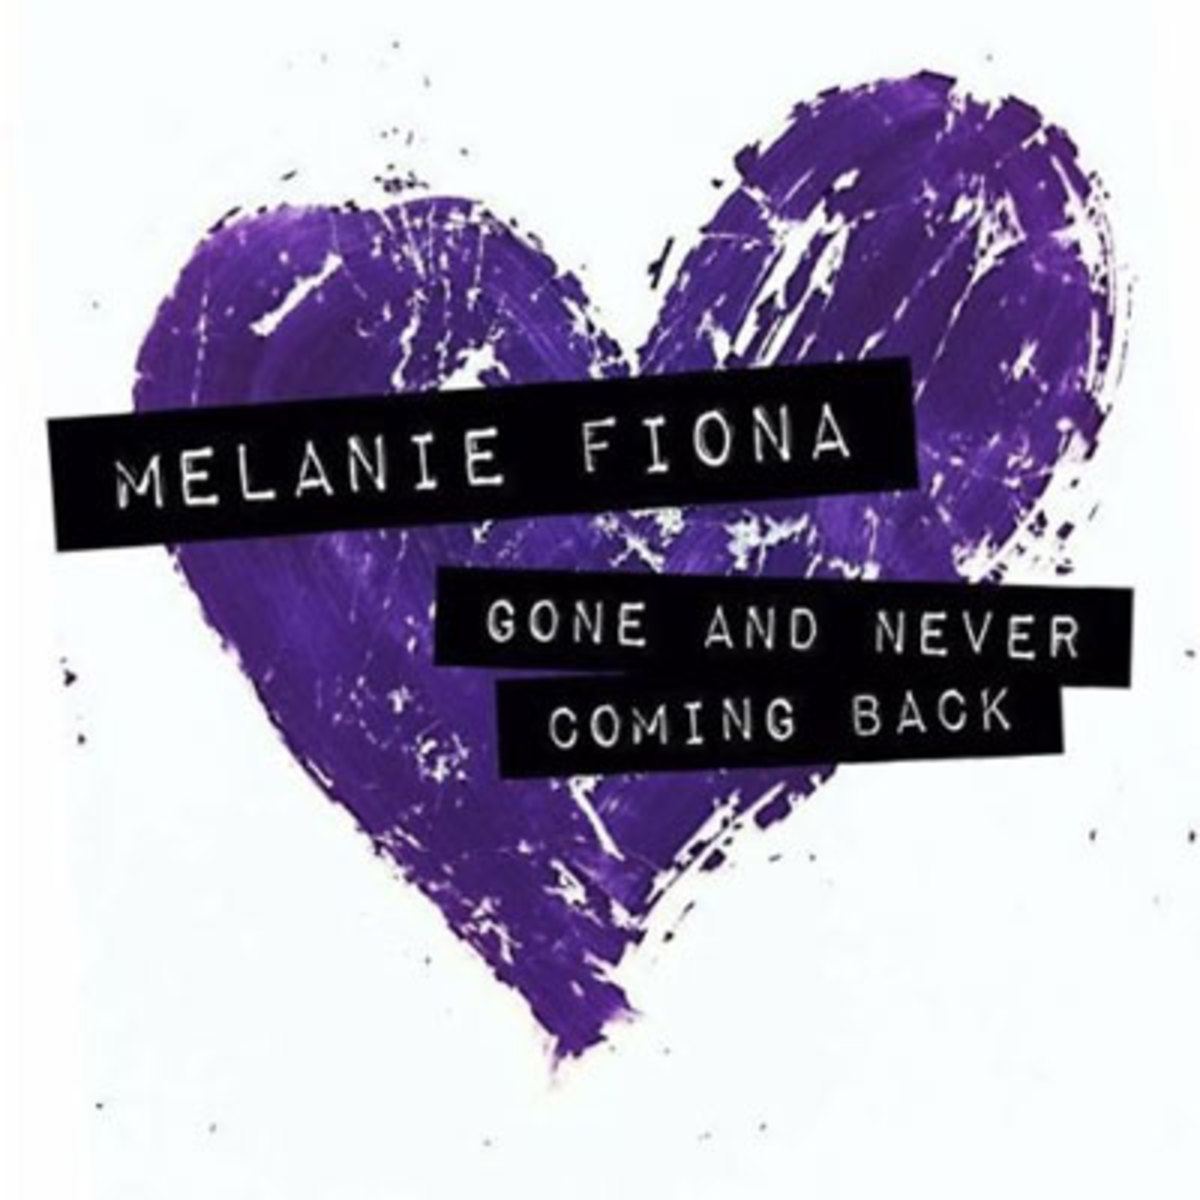 melaniefiona-goneandnevercomingback.jpg